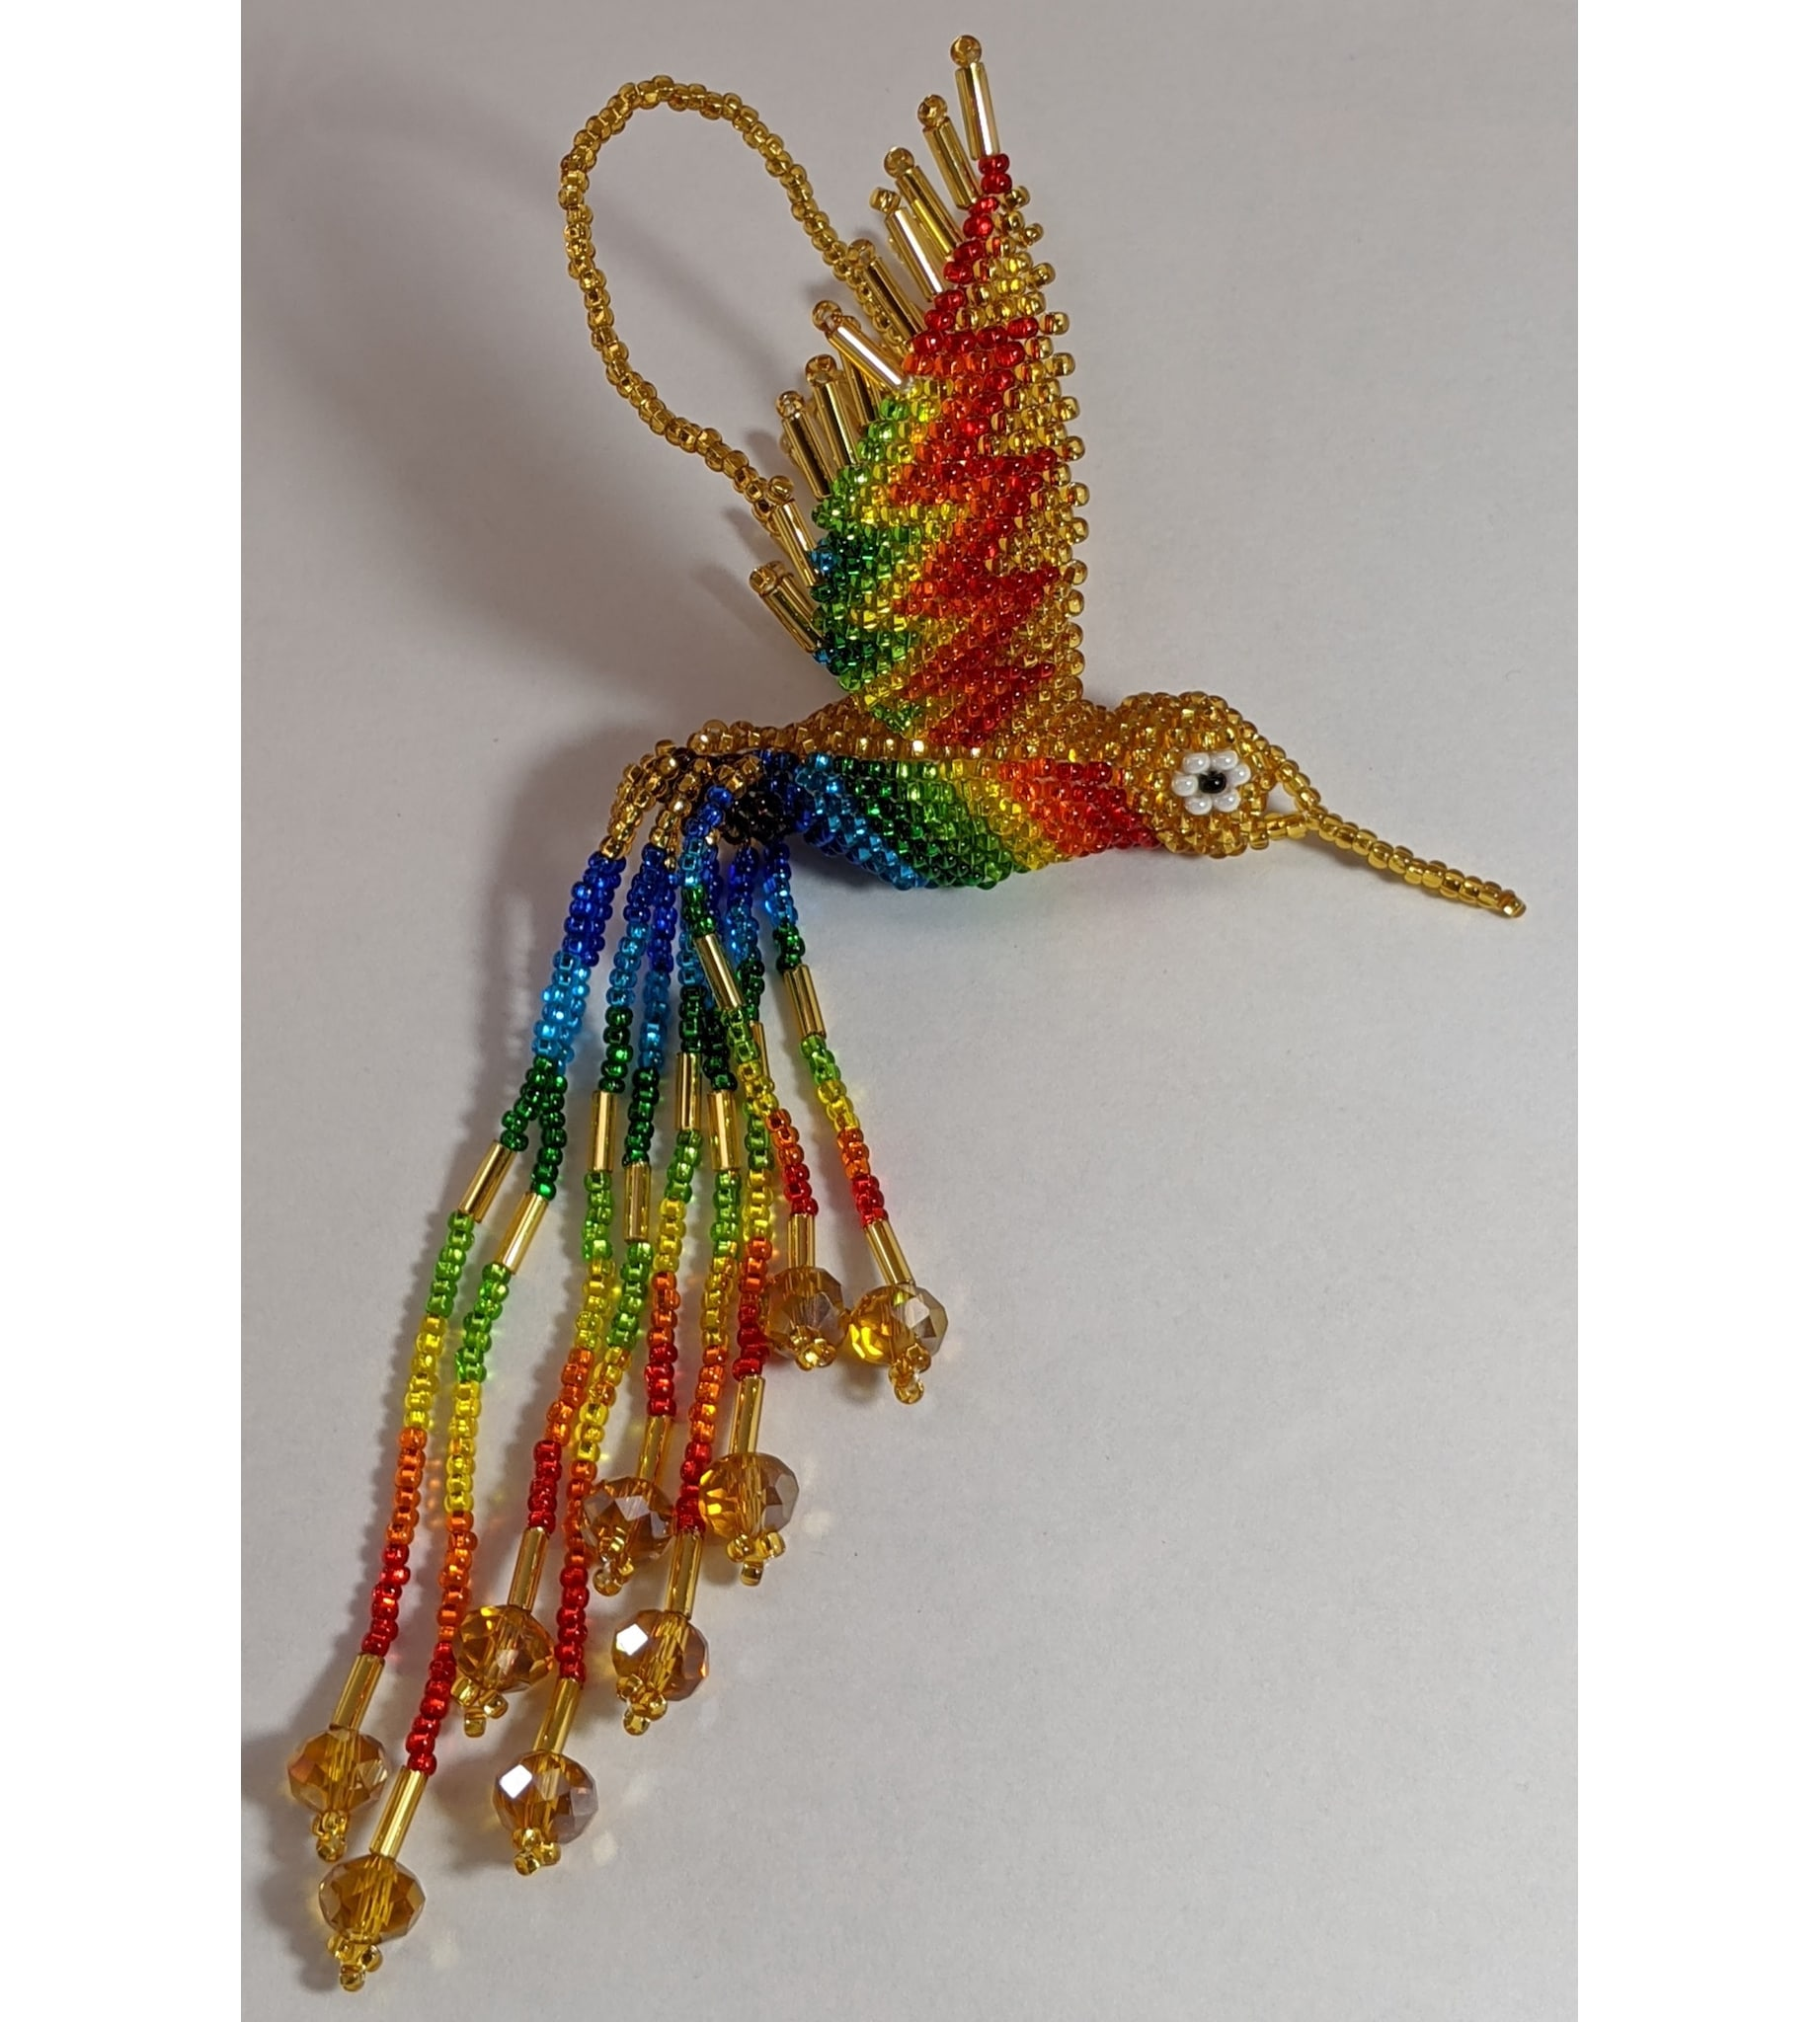 Hummingbird Beaded Ornament - Rainbow with Light Gold